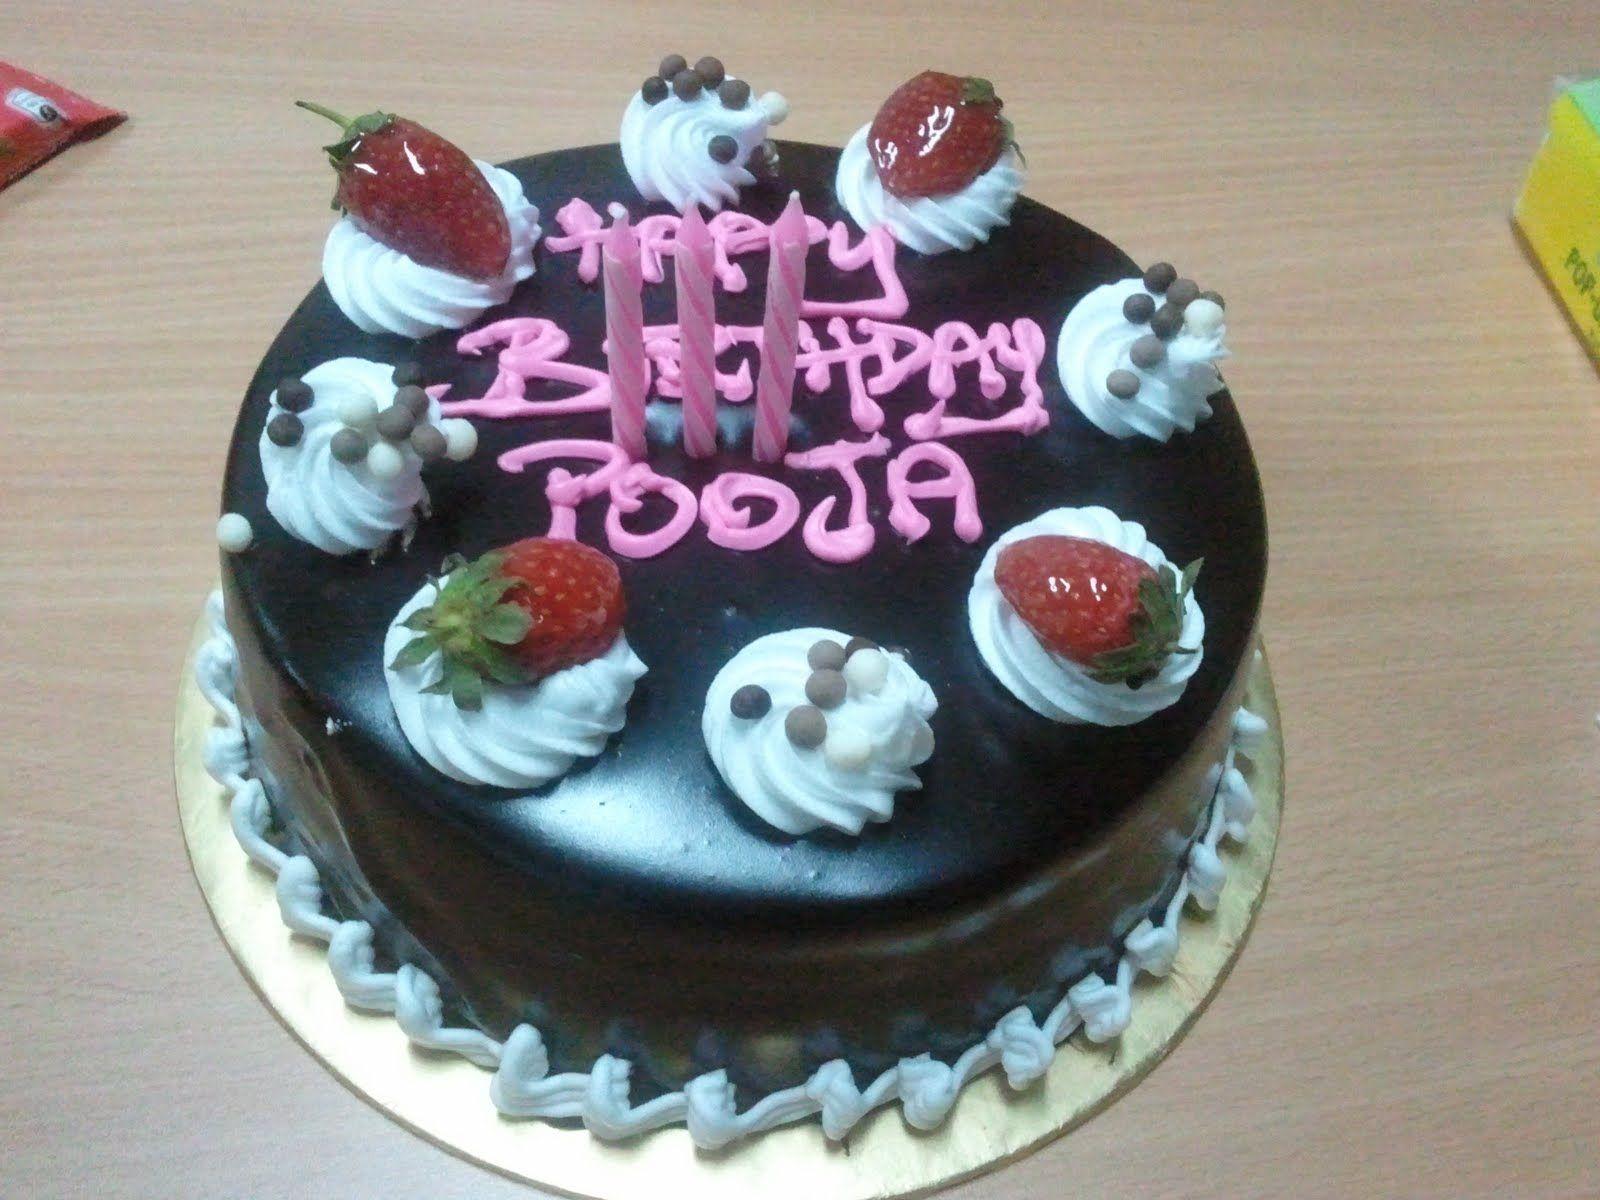 Happy Birthday Pooja Happy birthday cakes, Happy